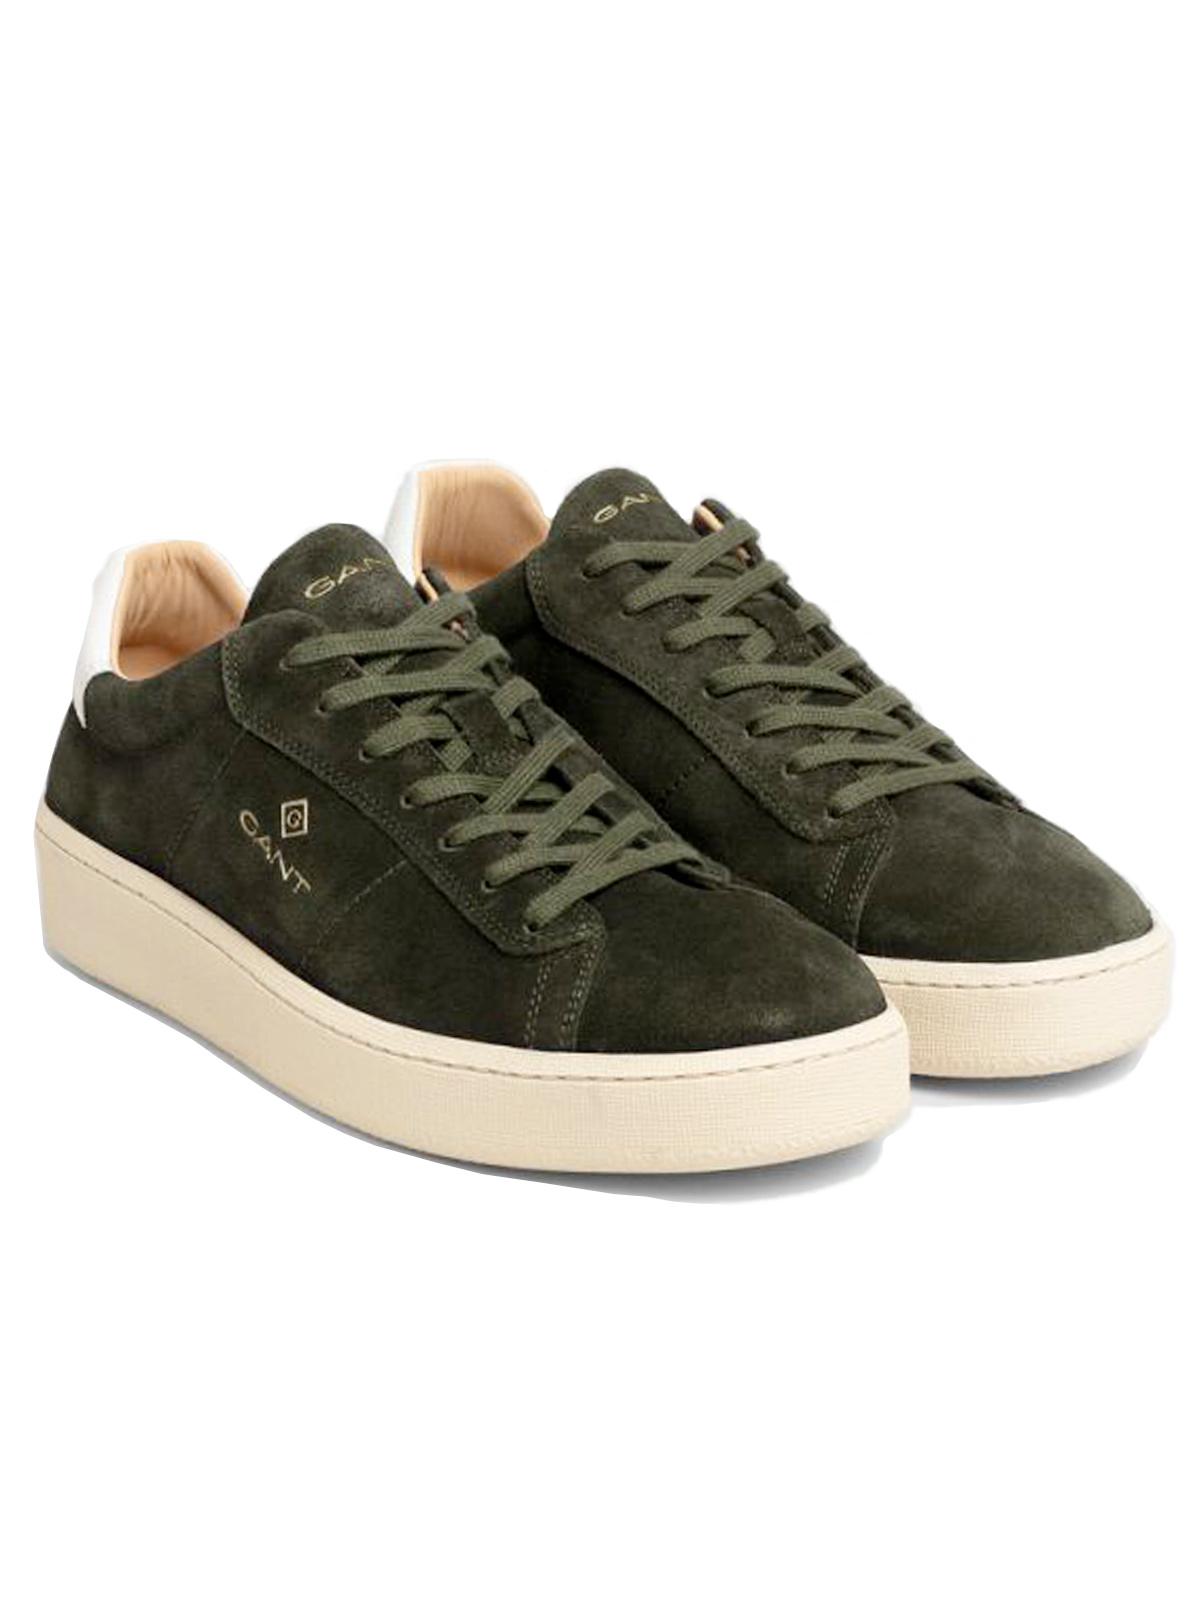 Picture of GANT | Men's Leville Sneakers